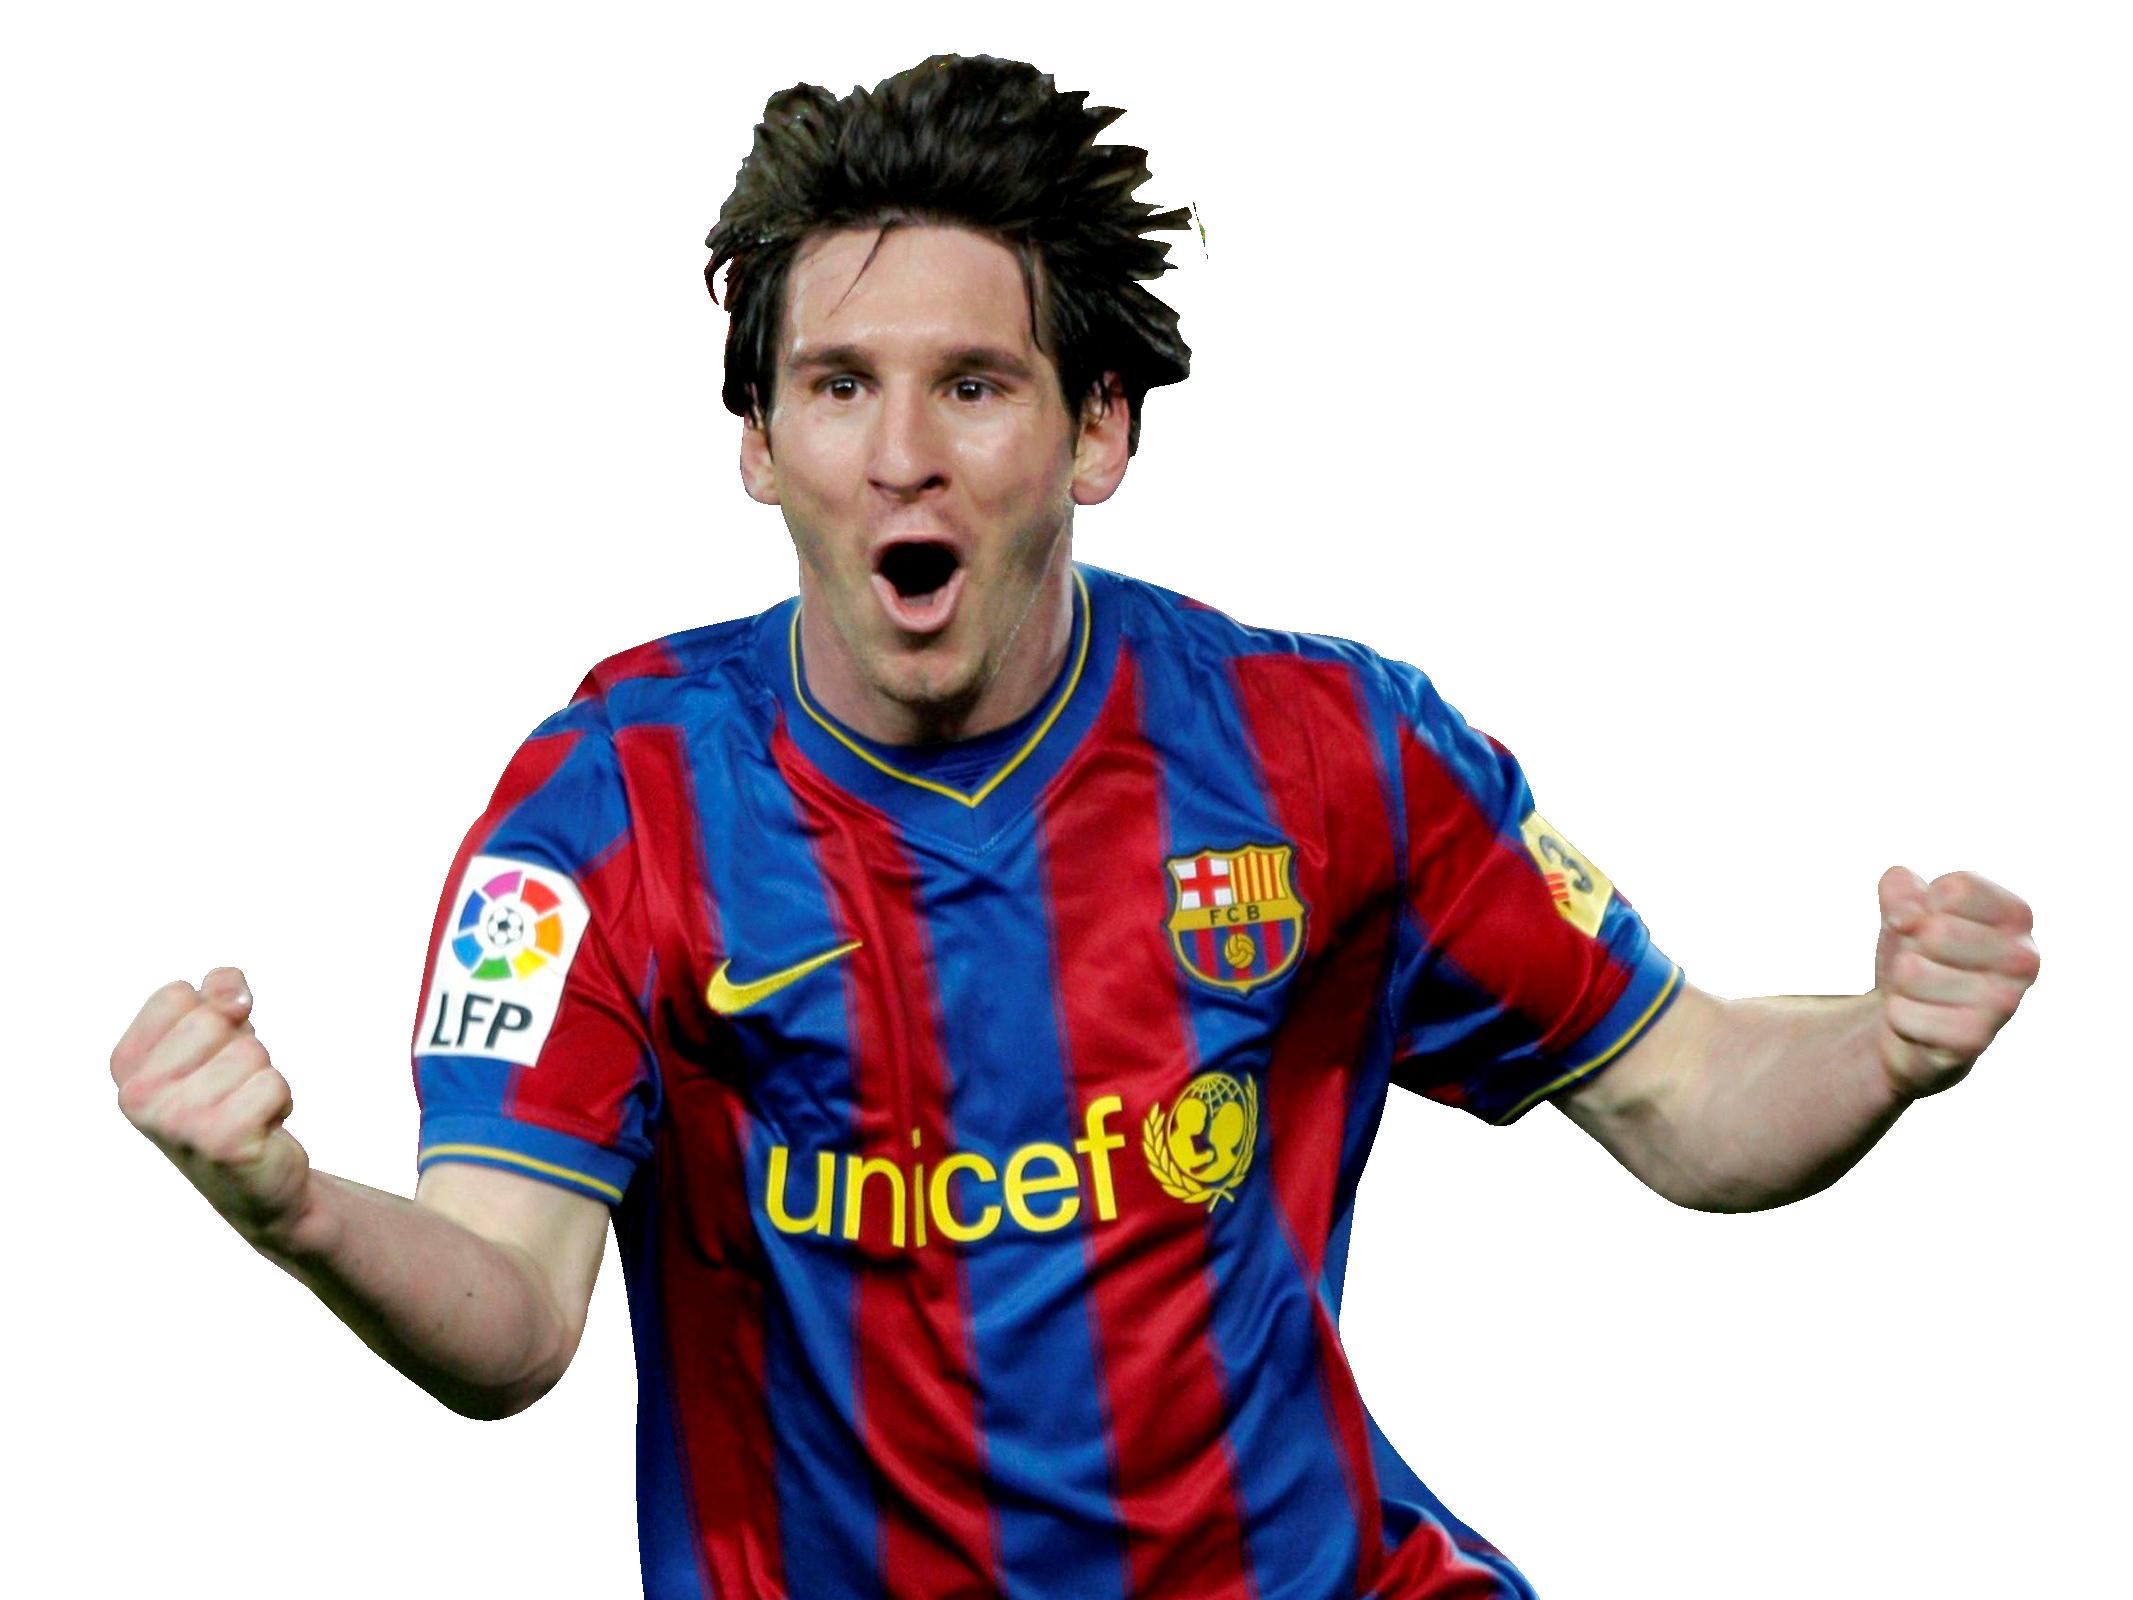 Lionel Messi PNG Transparent Image.